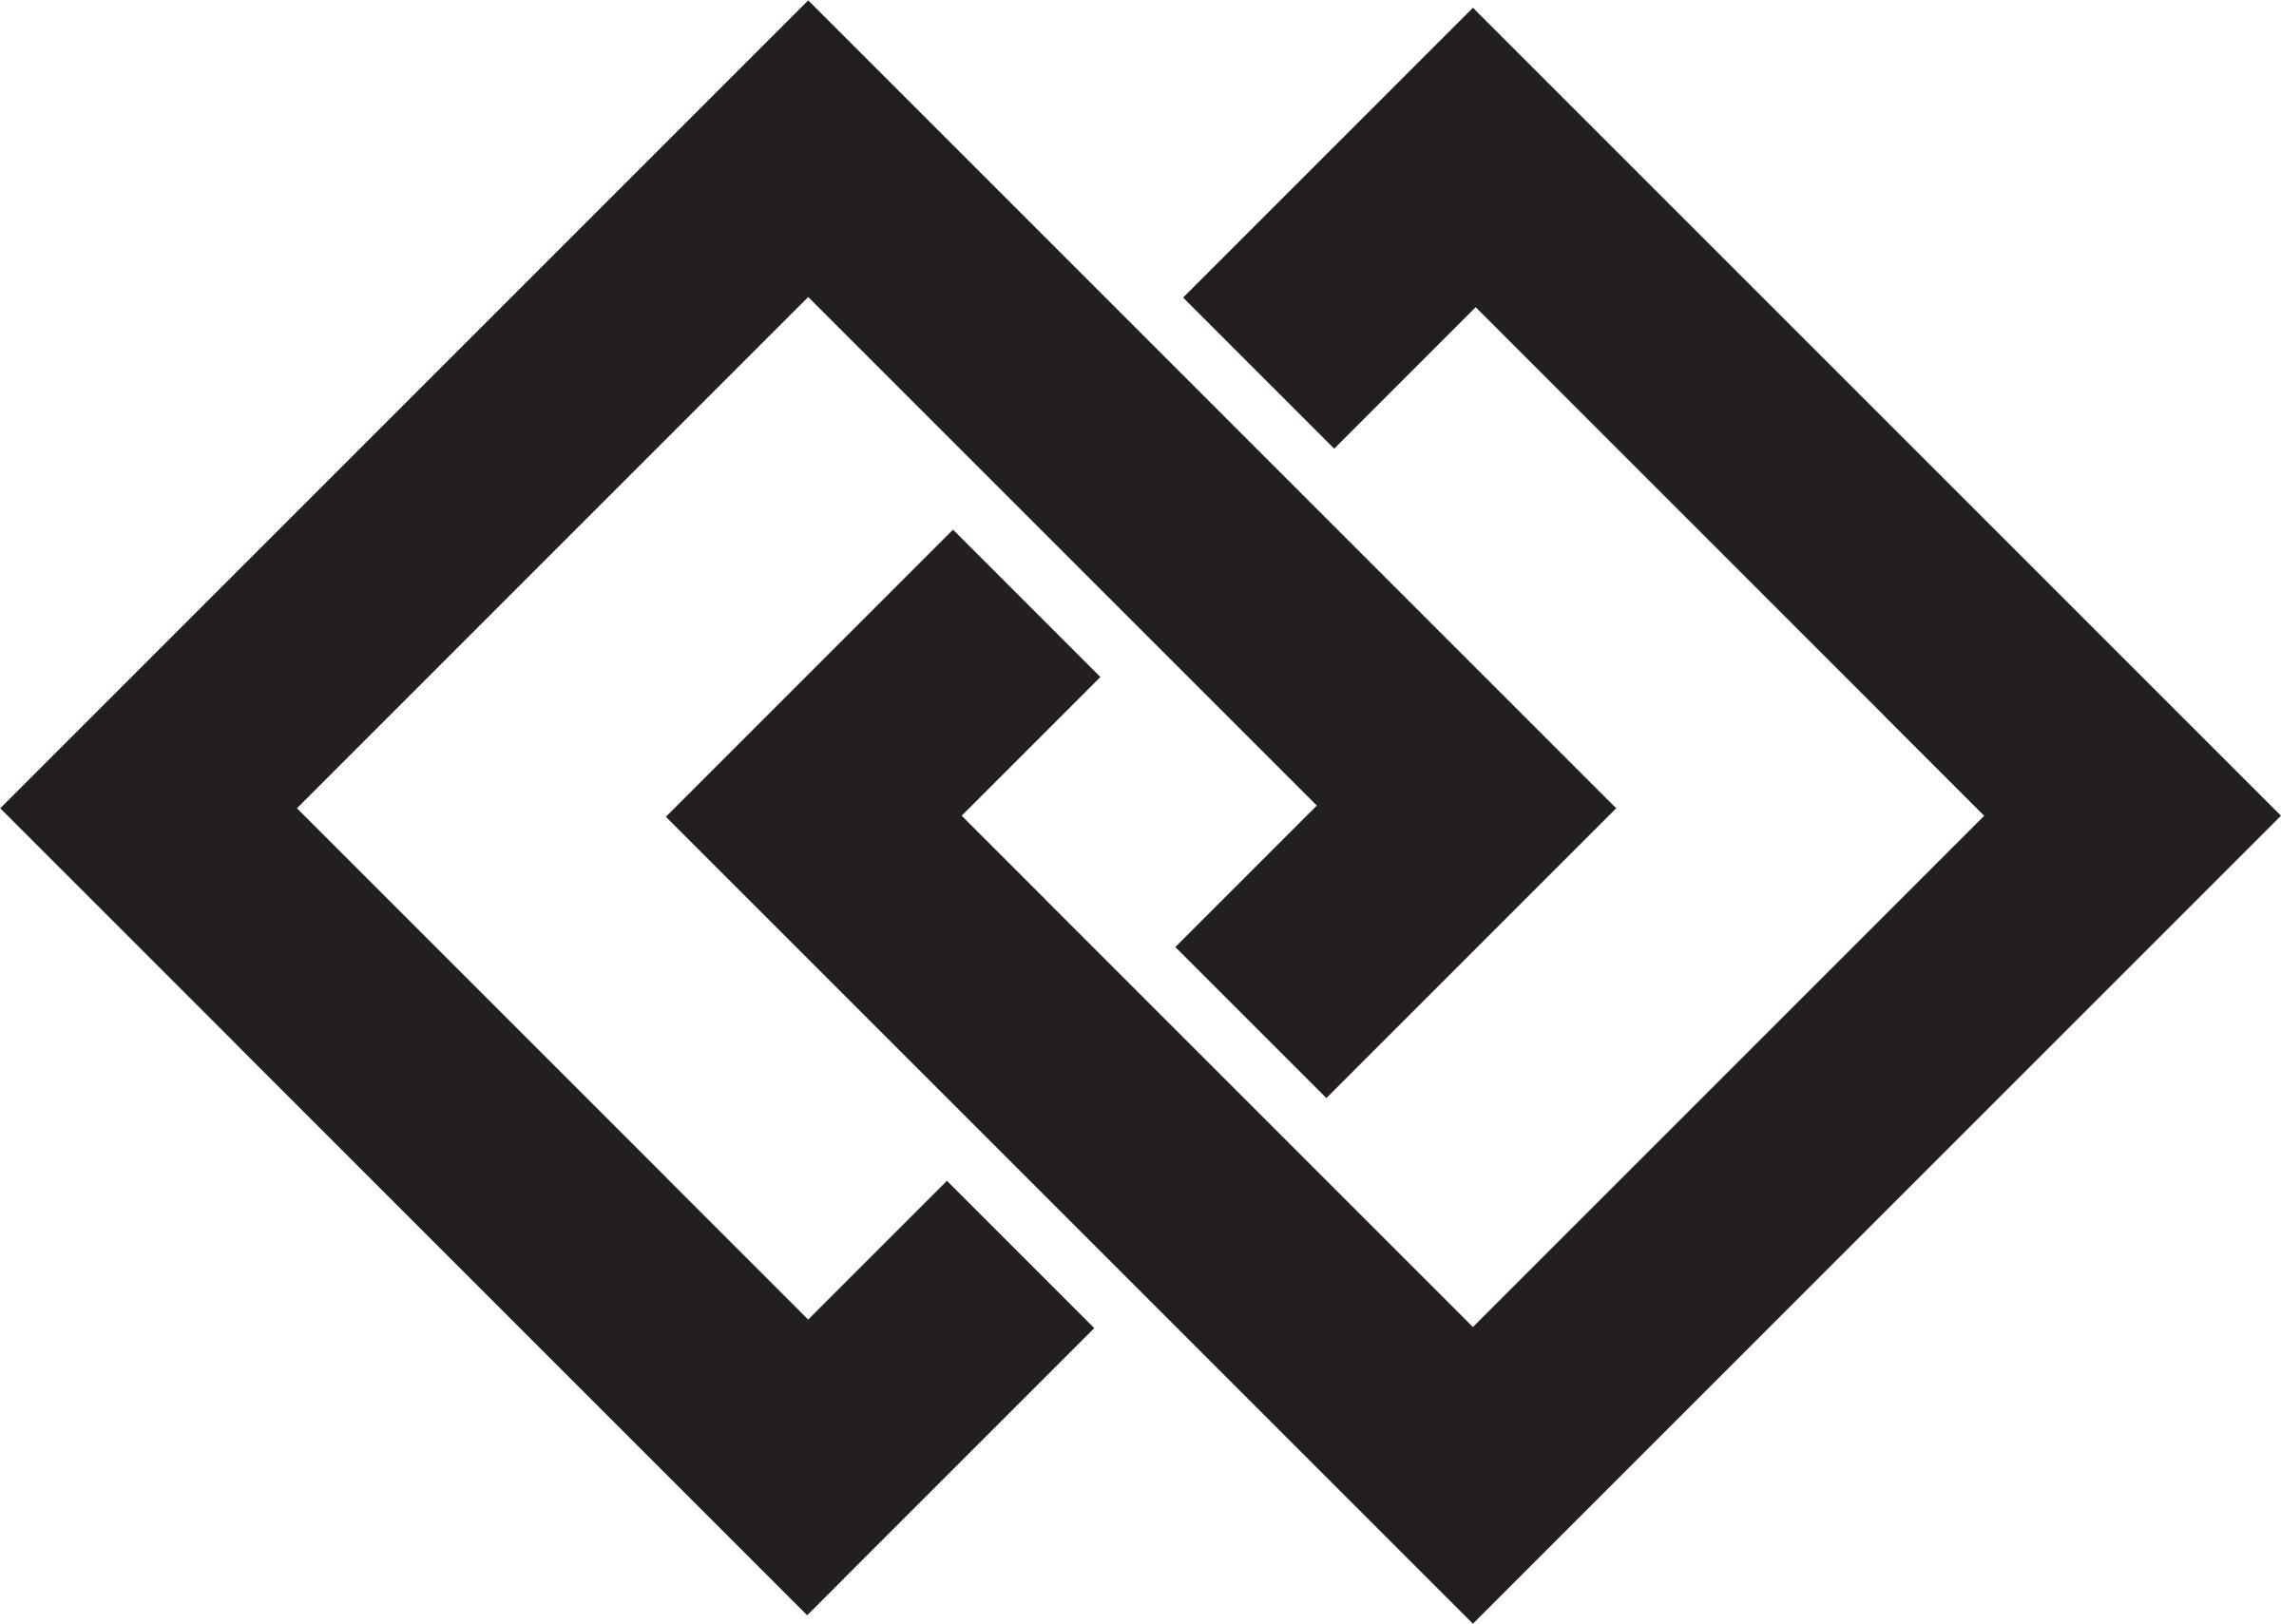 Friendship Symbols Images Stock Photos amp Vectors